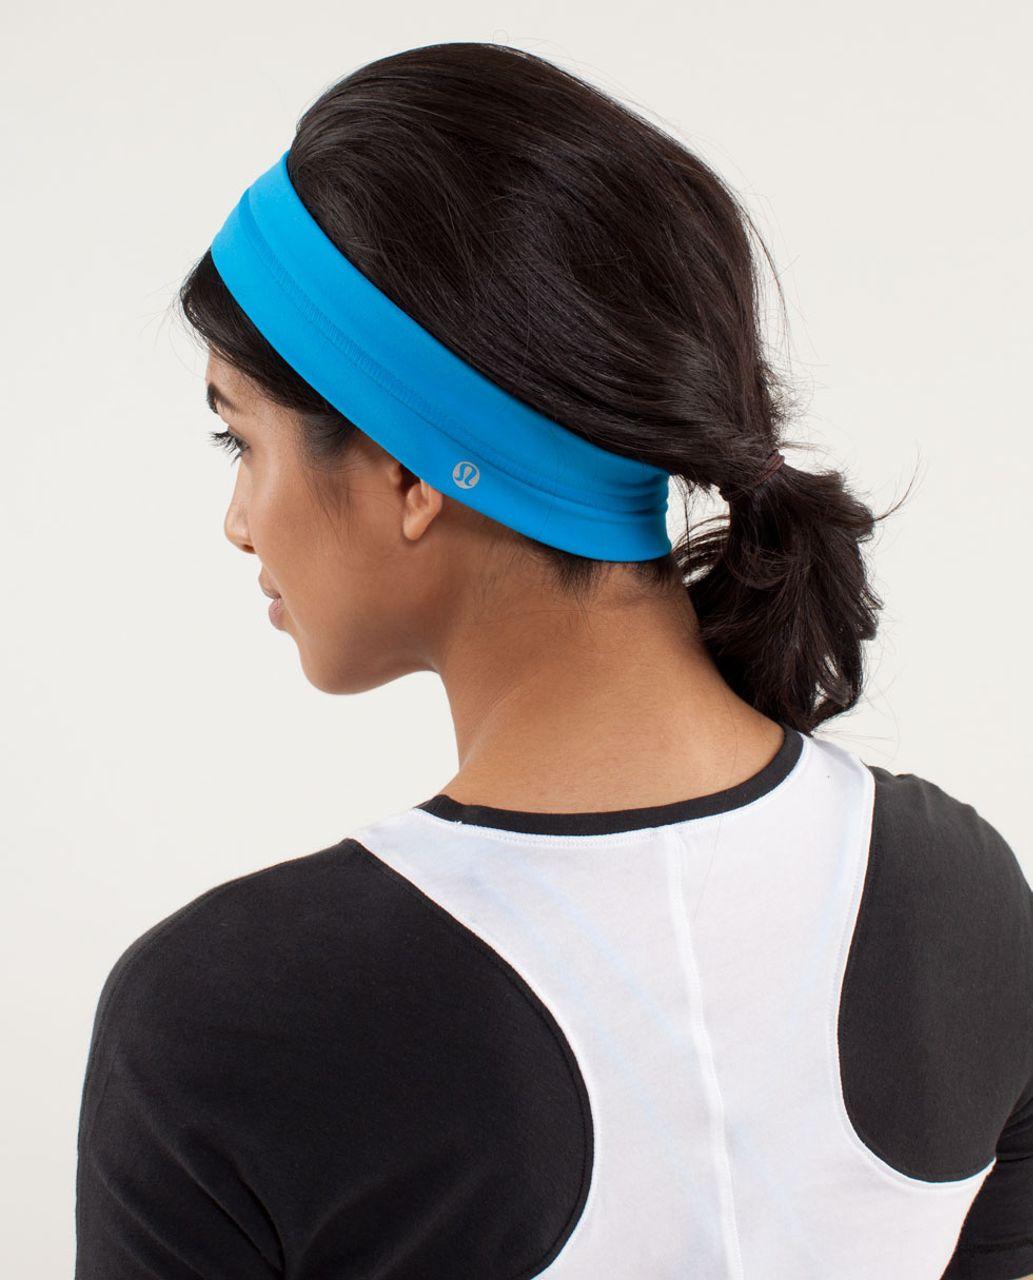 Lululemon Fly Away Tamer Headband - Beach Blanket Blue